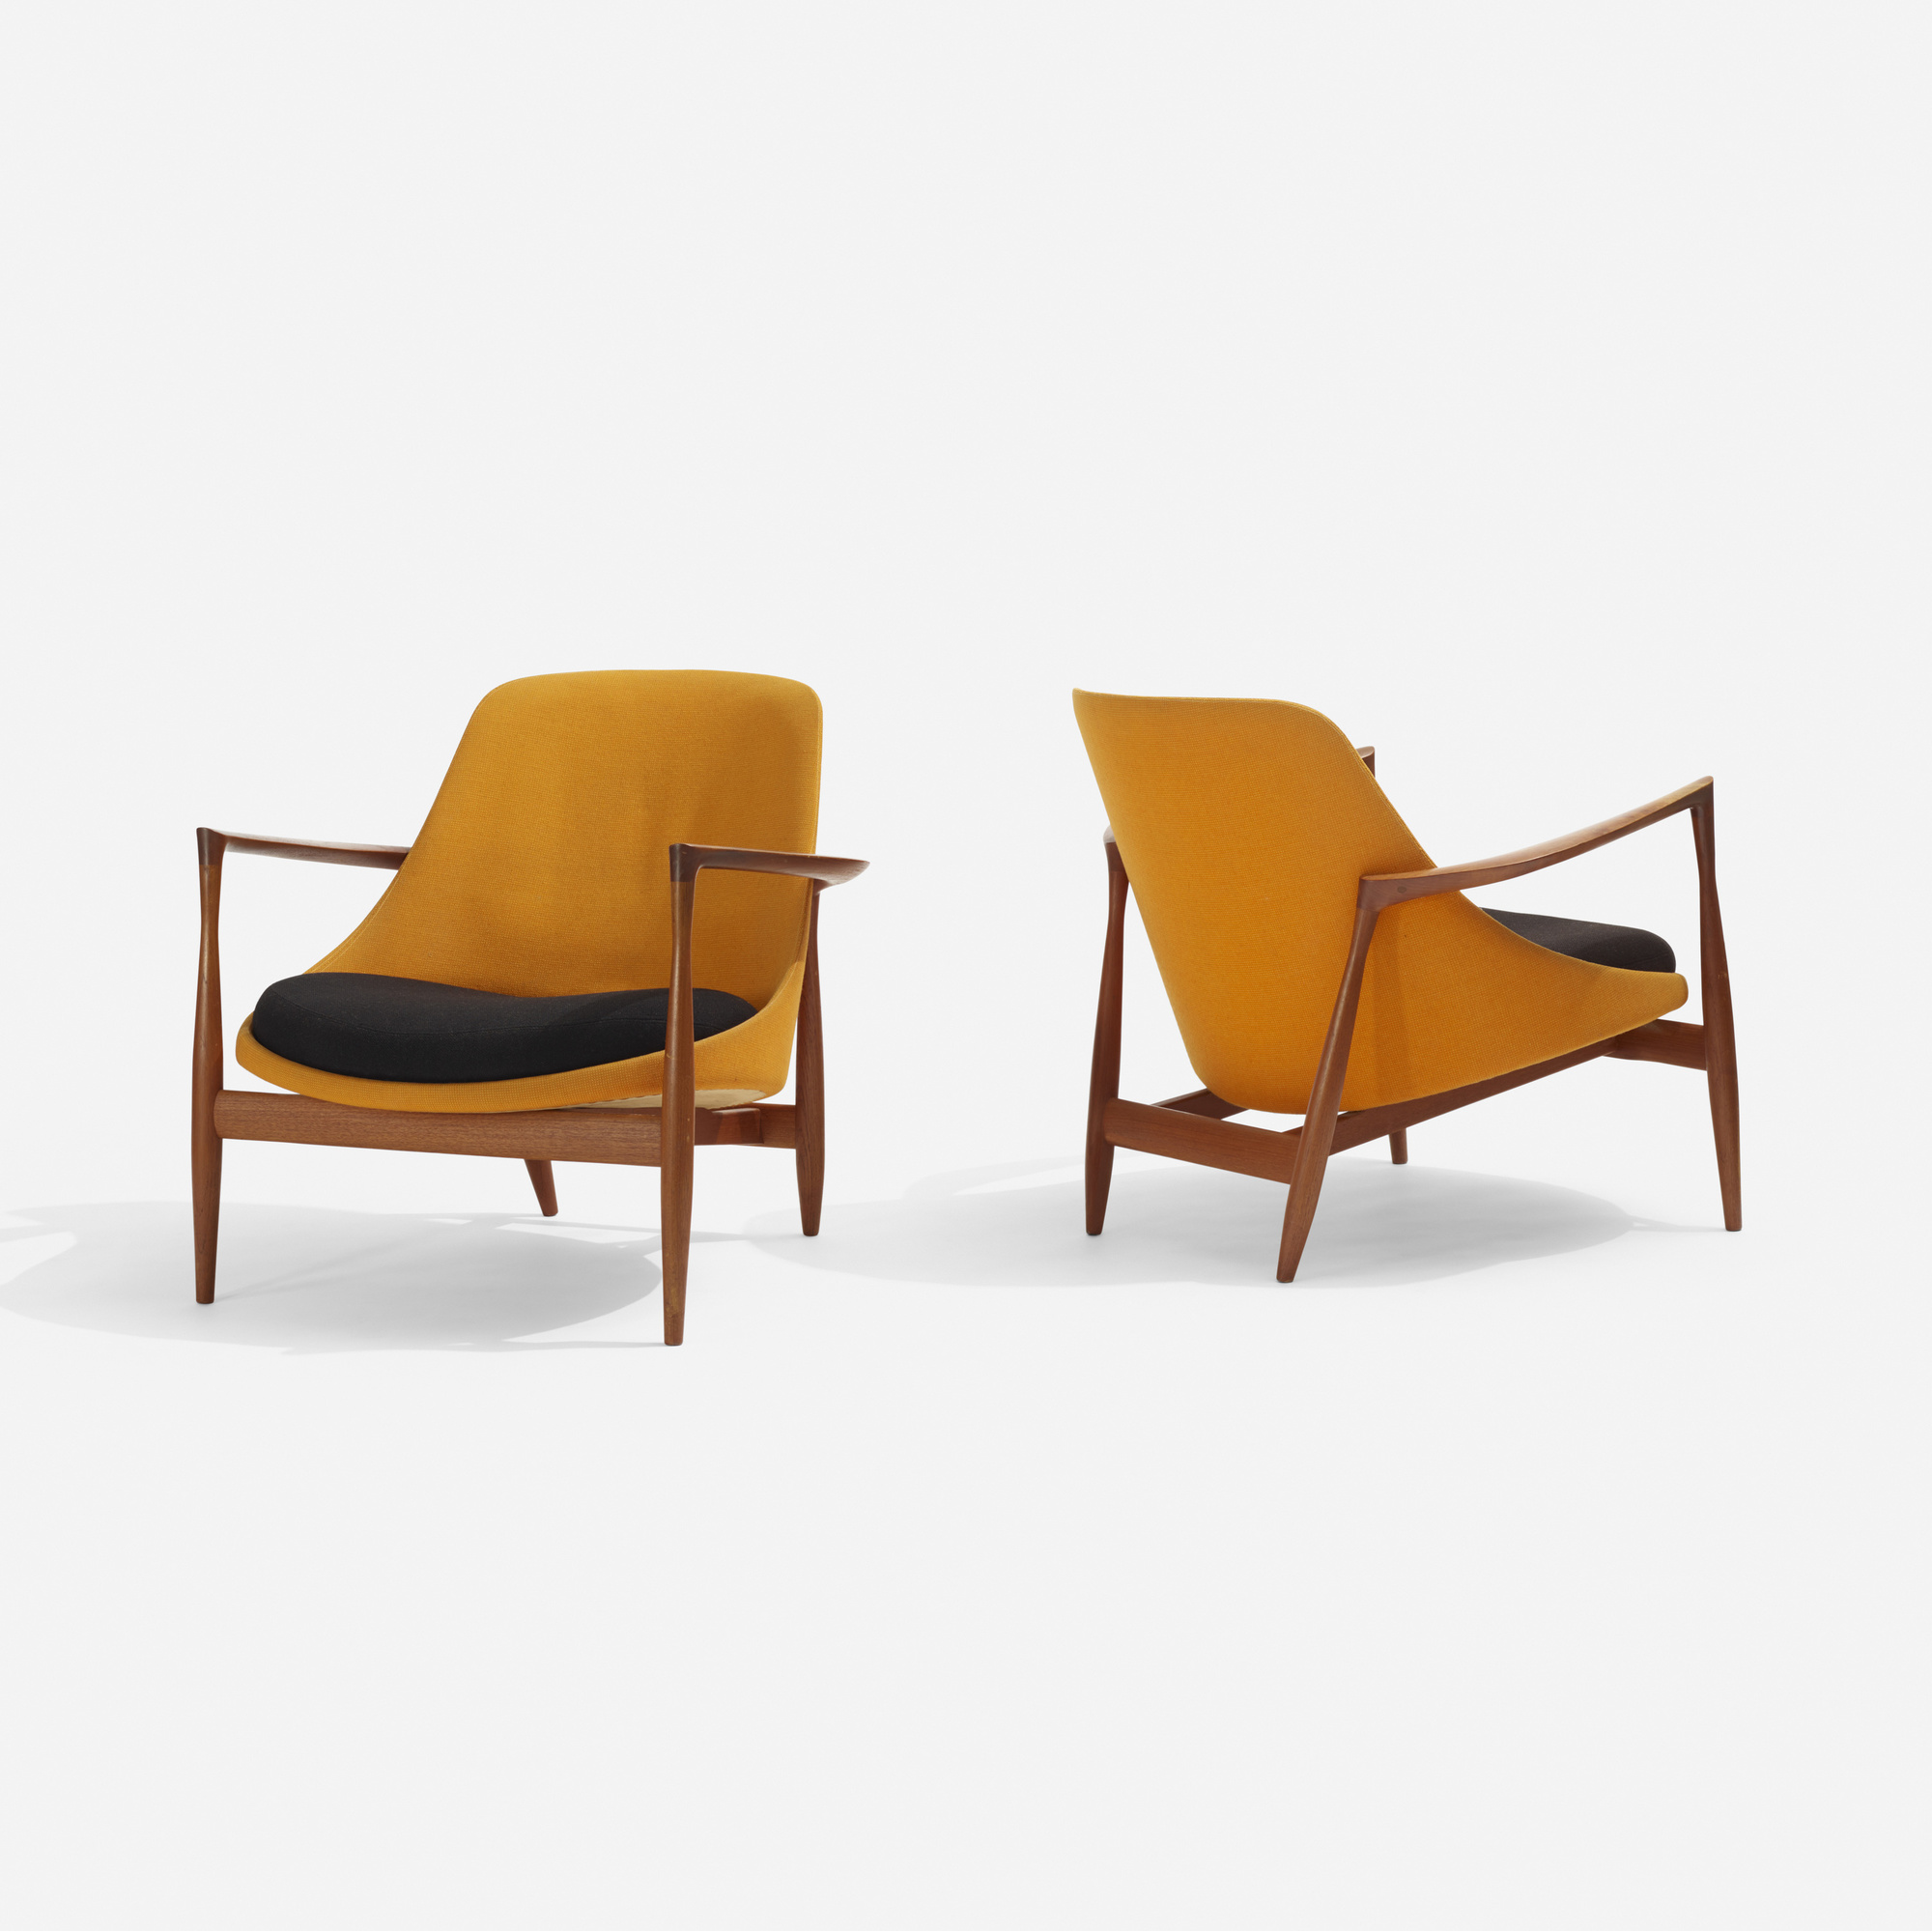 318: Ib Kofod-Larsen / Elizabeth chairs, pair (1 of 4)